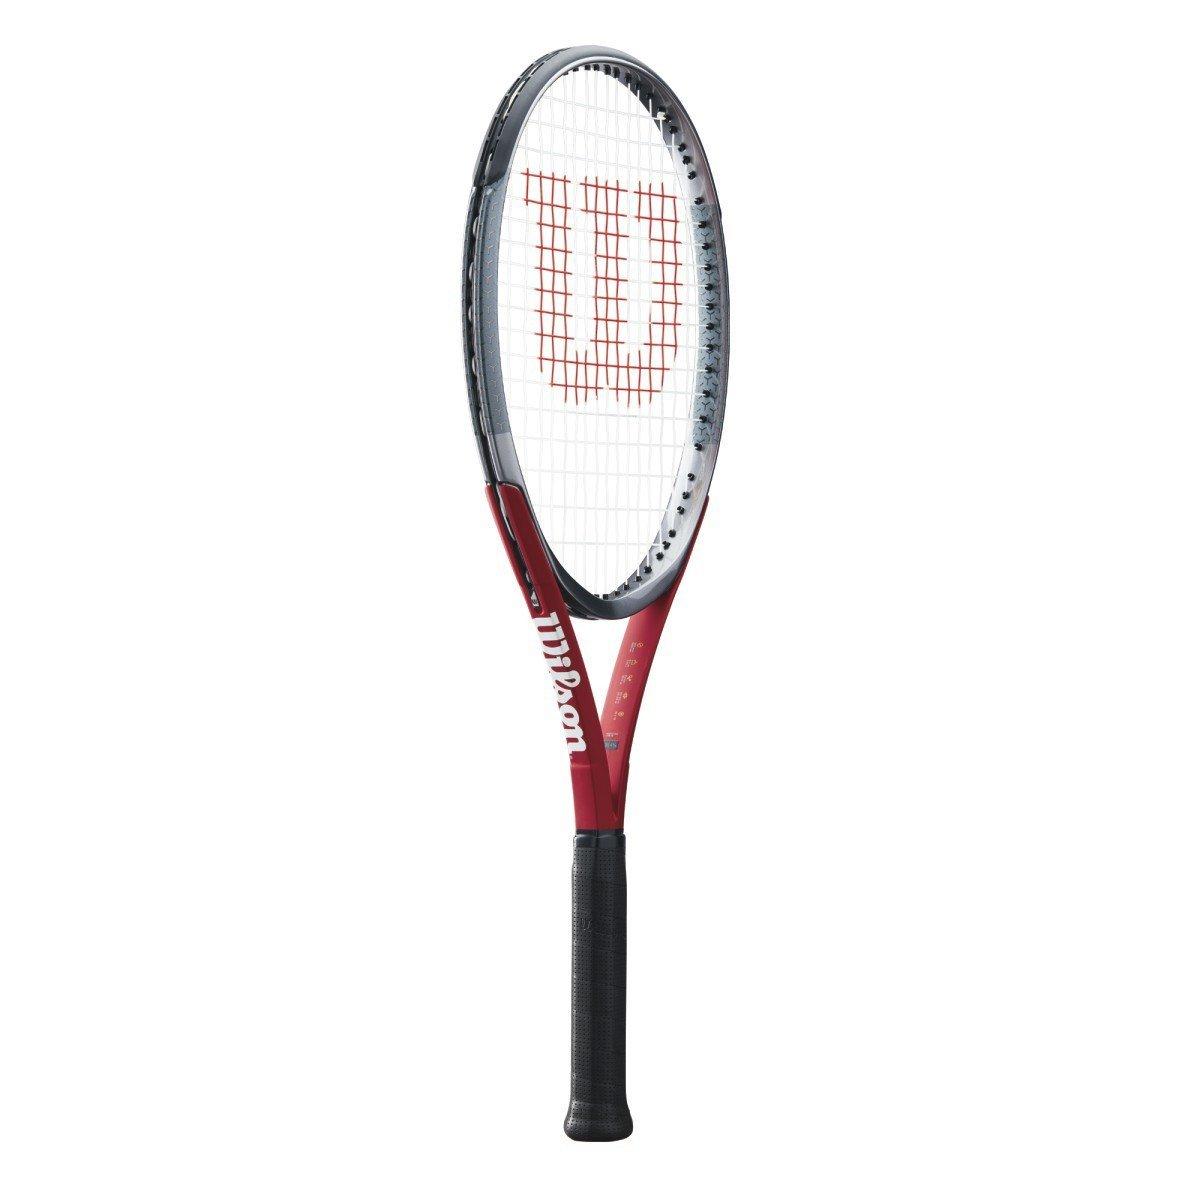 Wilson Tennis Racket – Triad XP 5